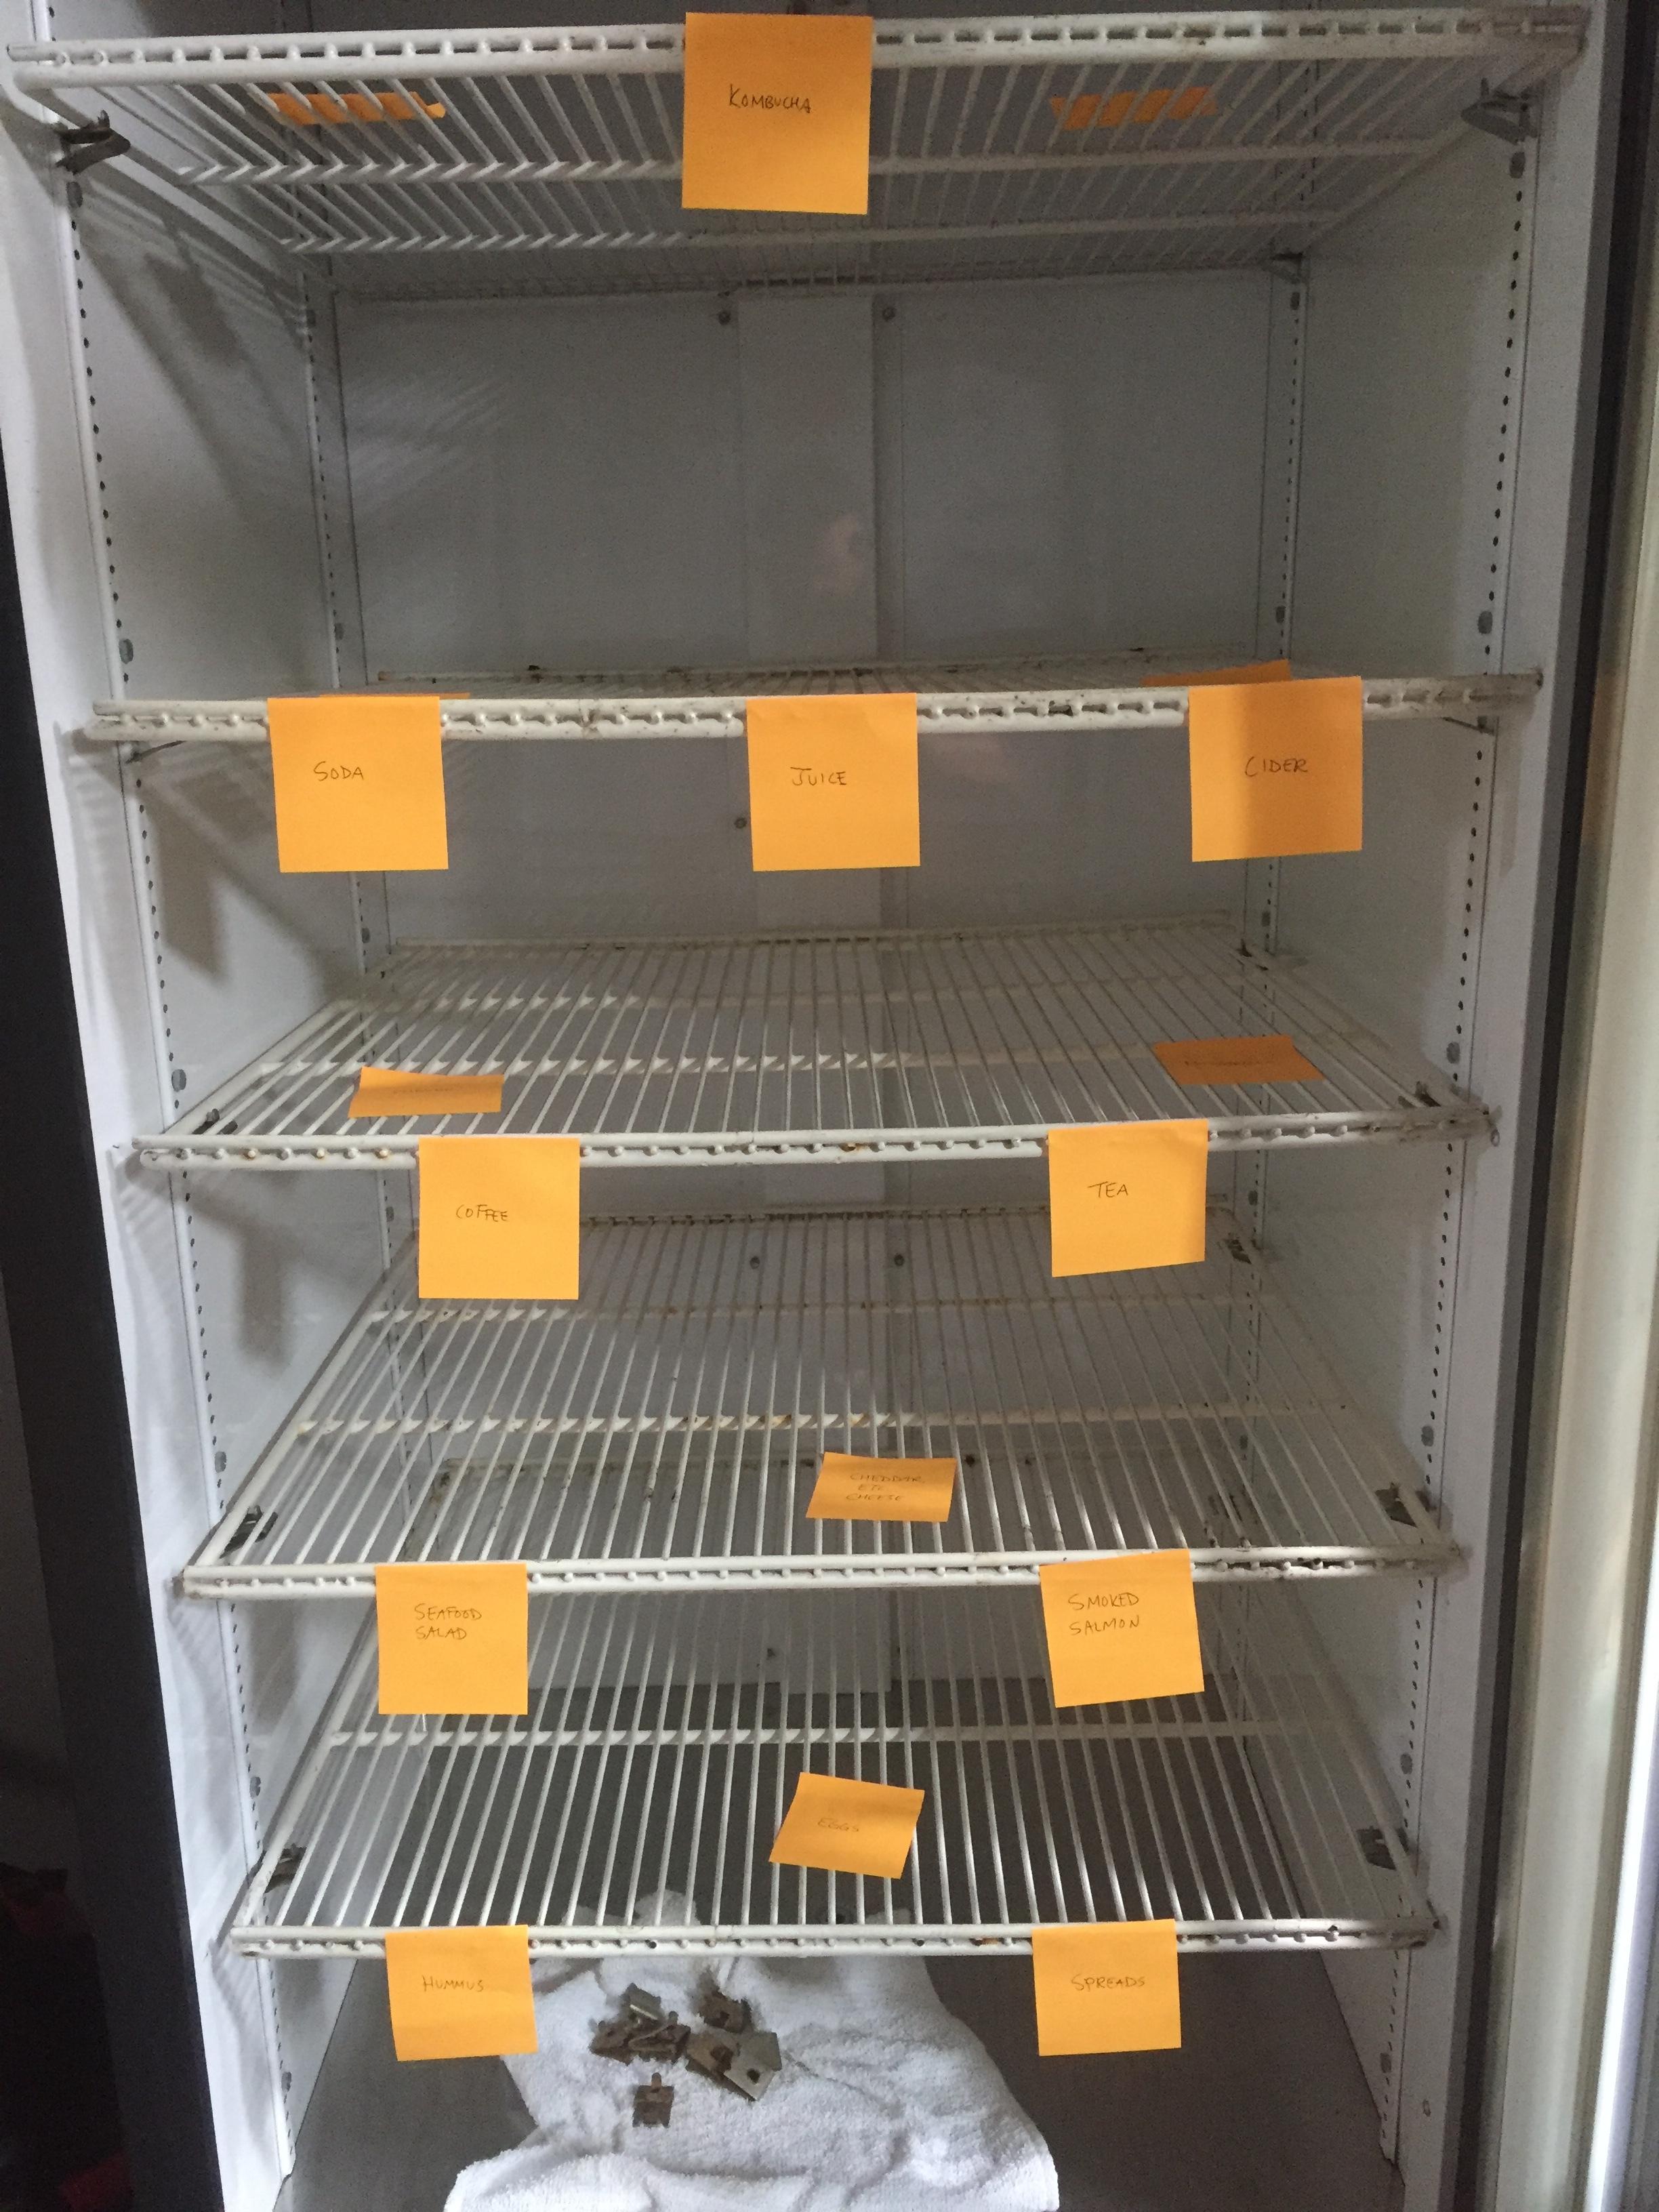 refrigerator_layout.JPG